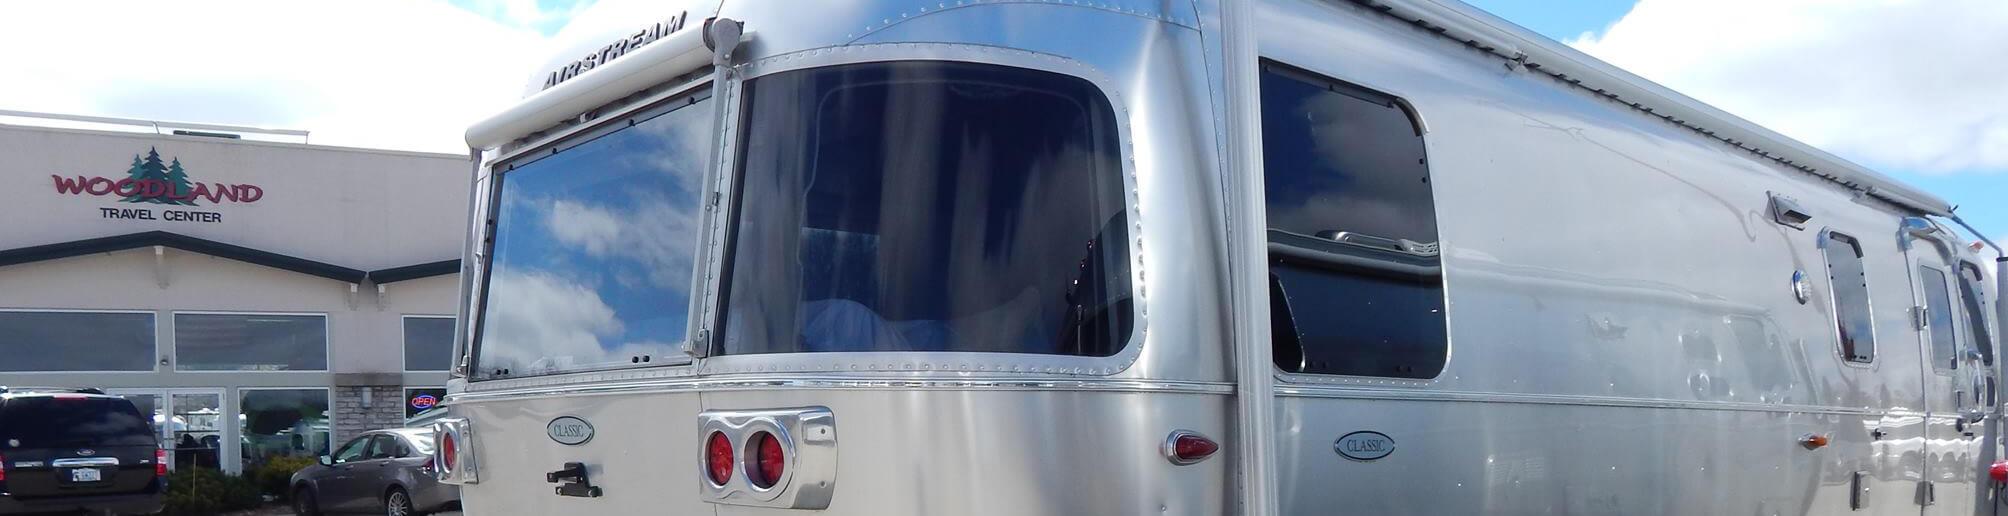 Our Airstream Inventory | Woodland Airstream | Grand Rapids